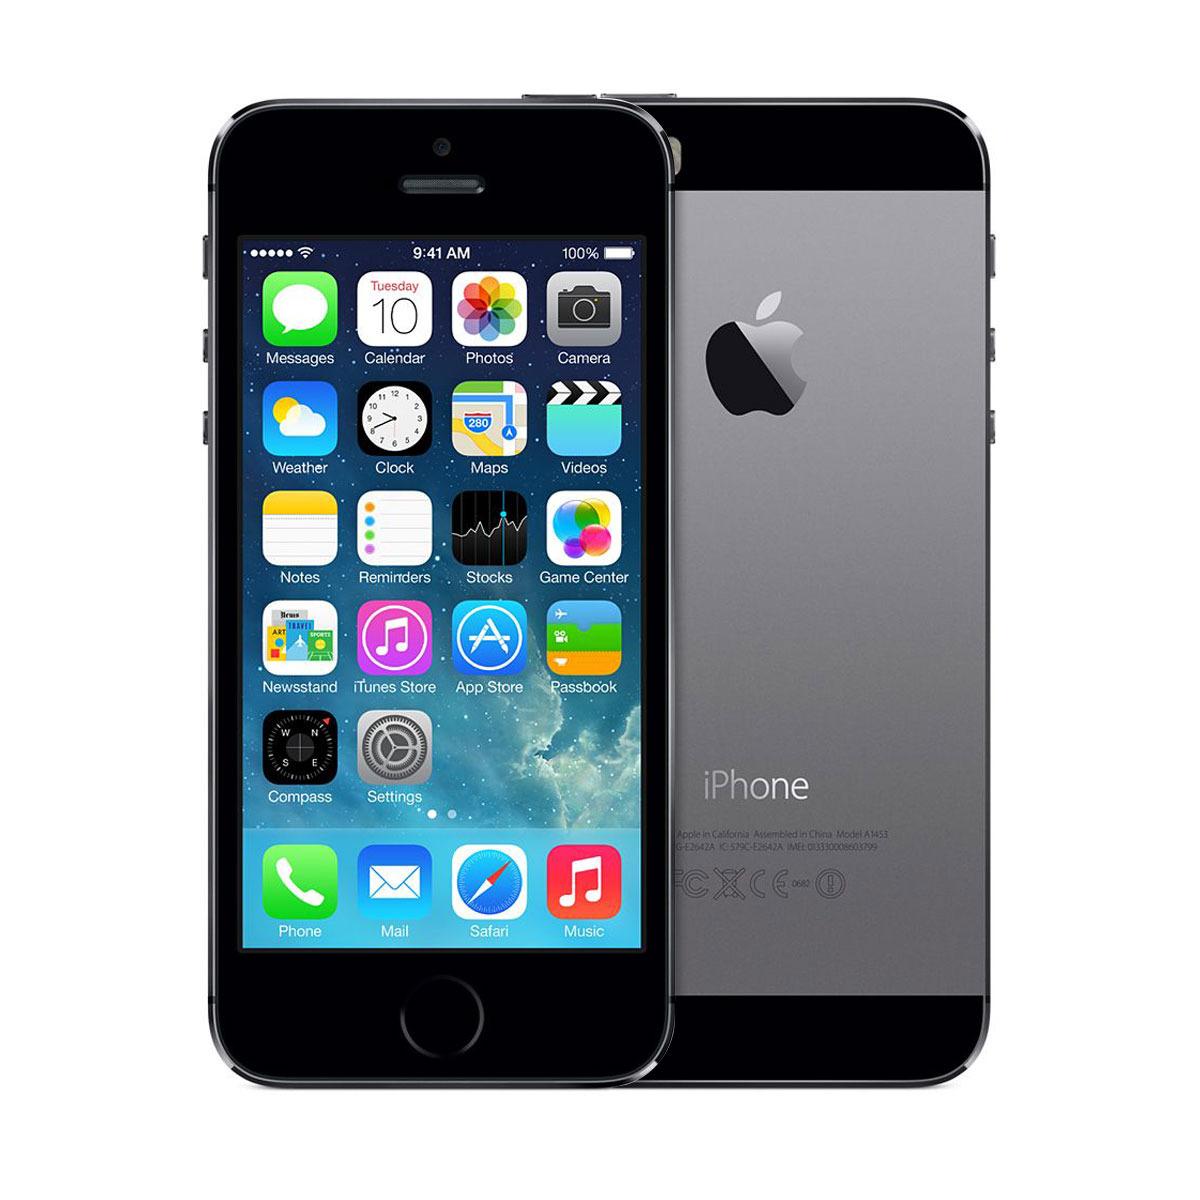 Ap apple iphone 5s space gray 32gb - Unlocked Apple Iphone 5s 32gb Ios 7 Smartphone Space Gray Me308ll A